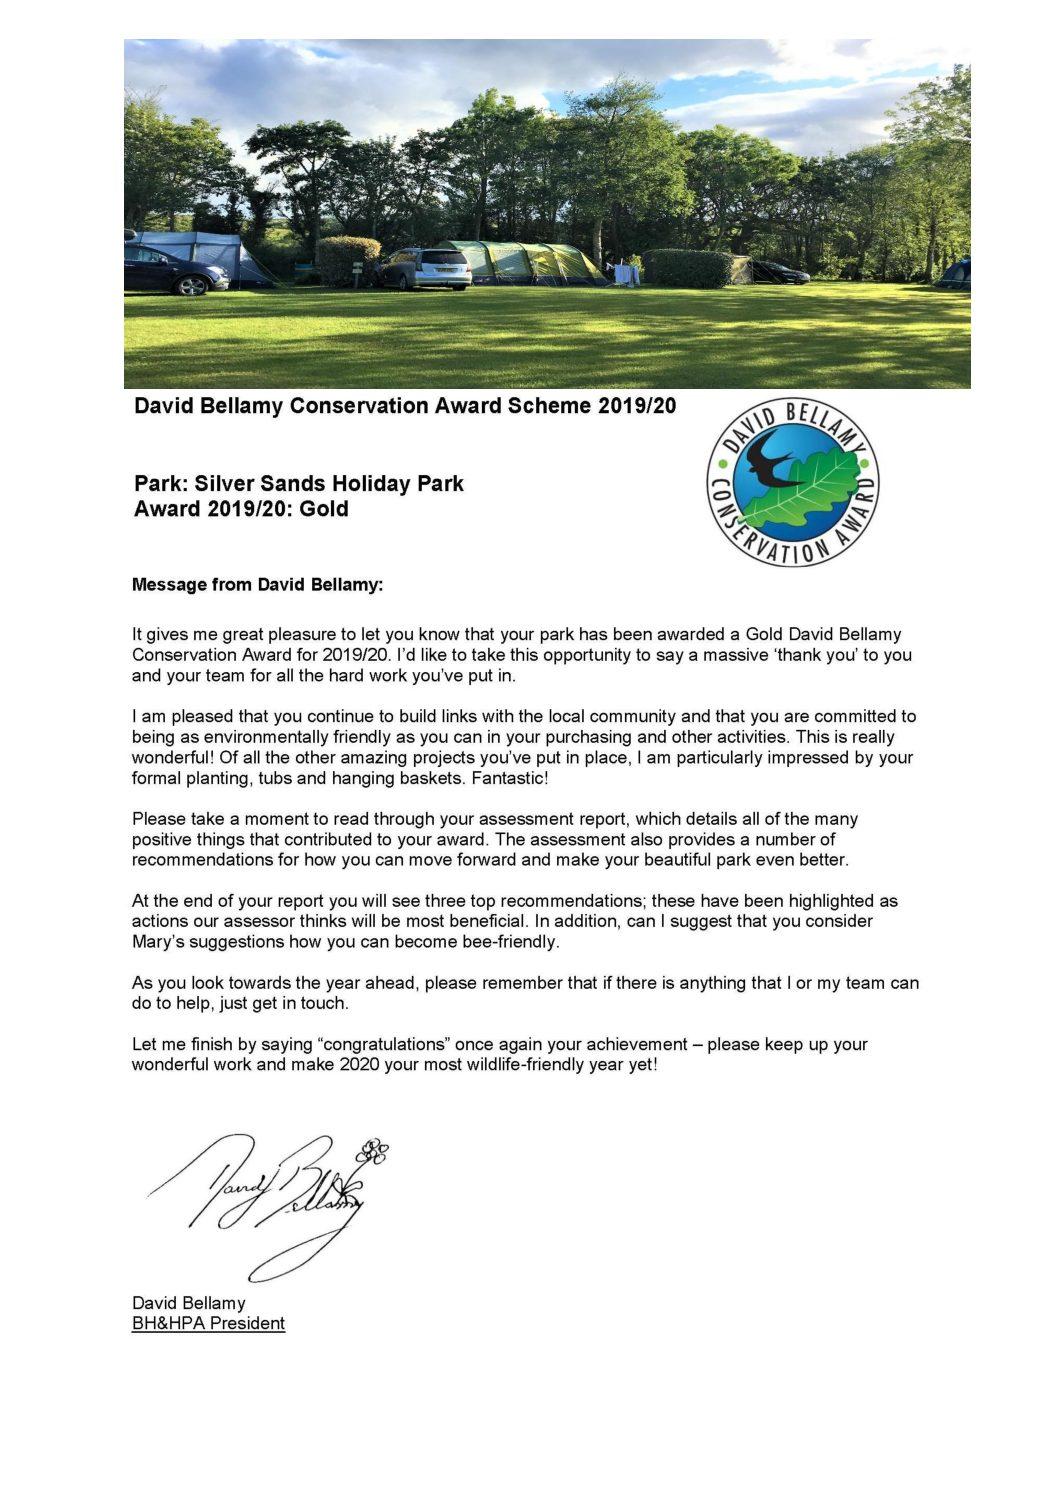 David Bellamy Conservation Award Scheme 2019/20